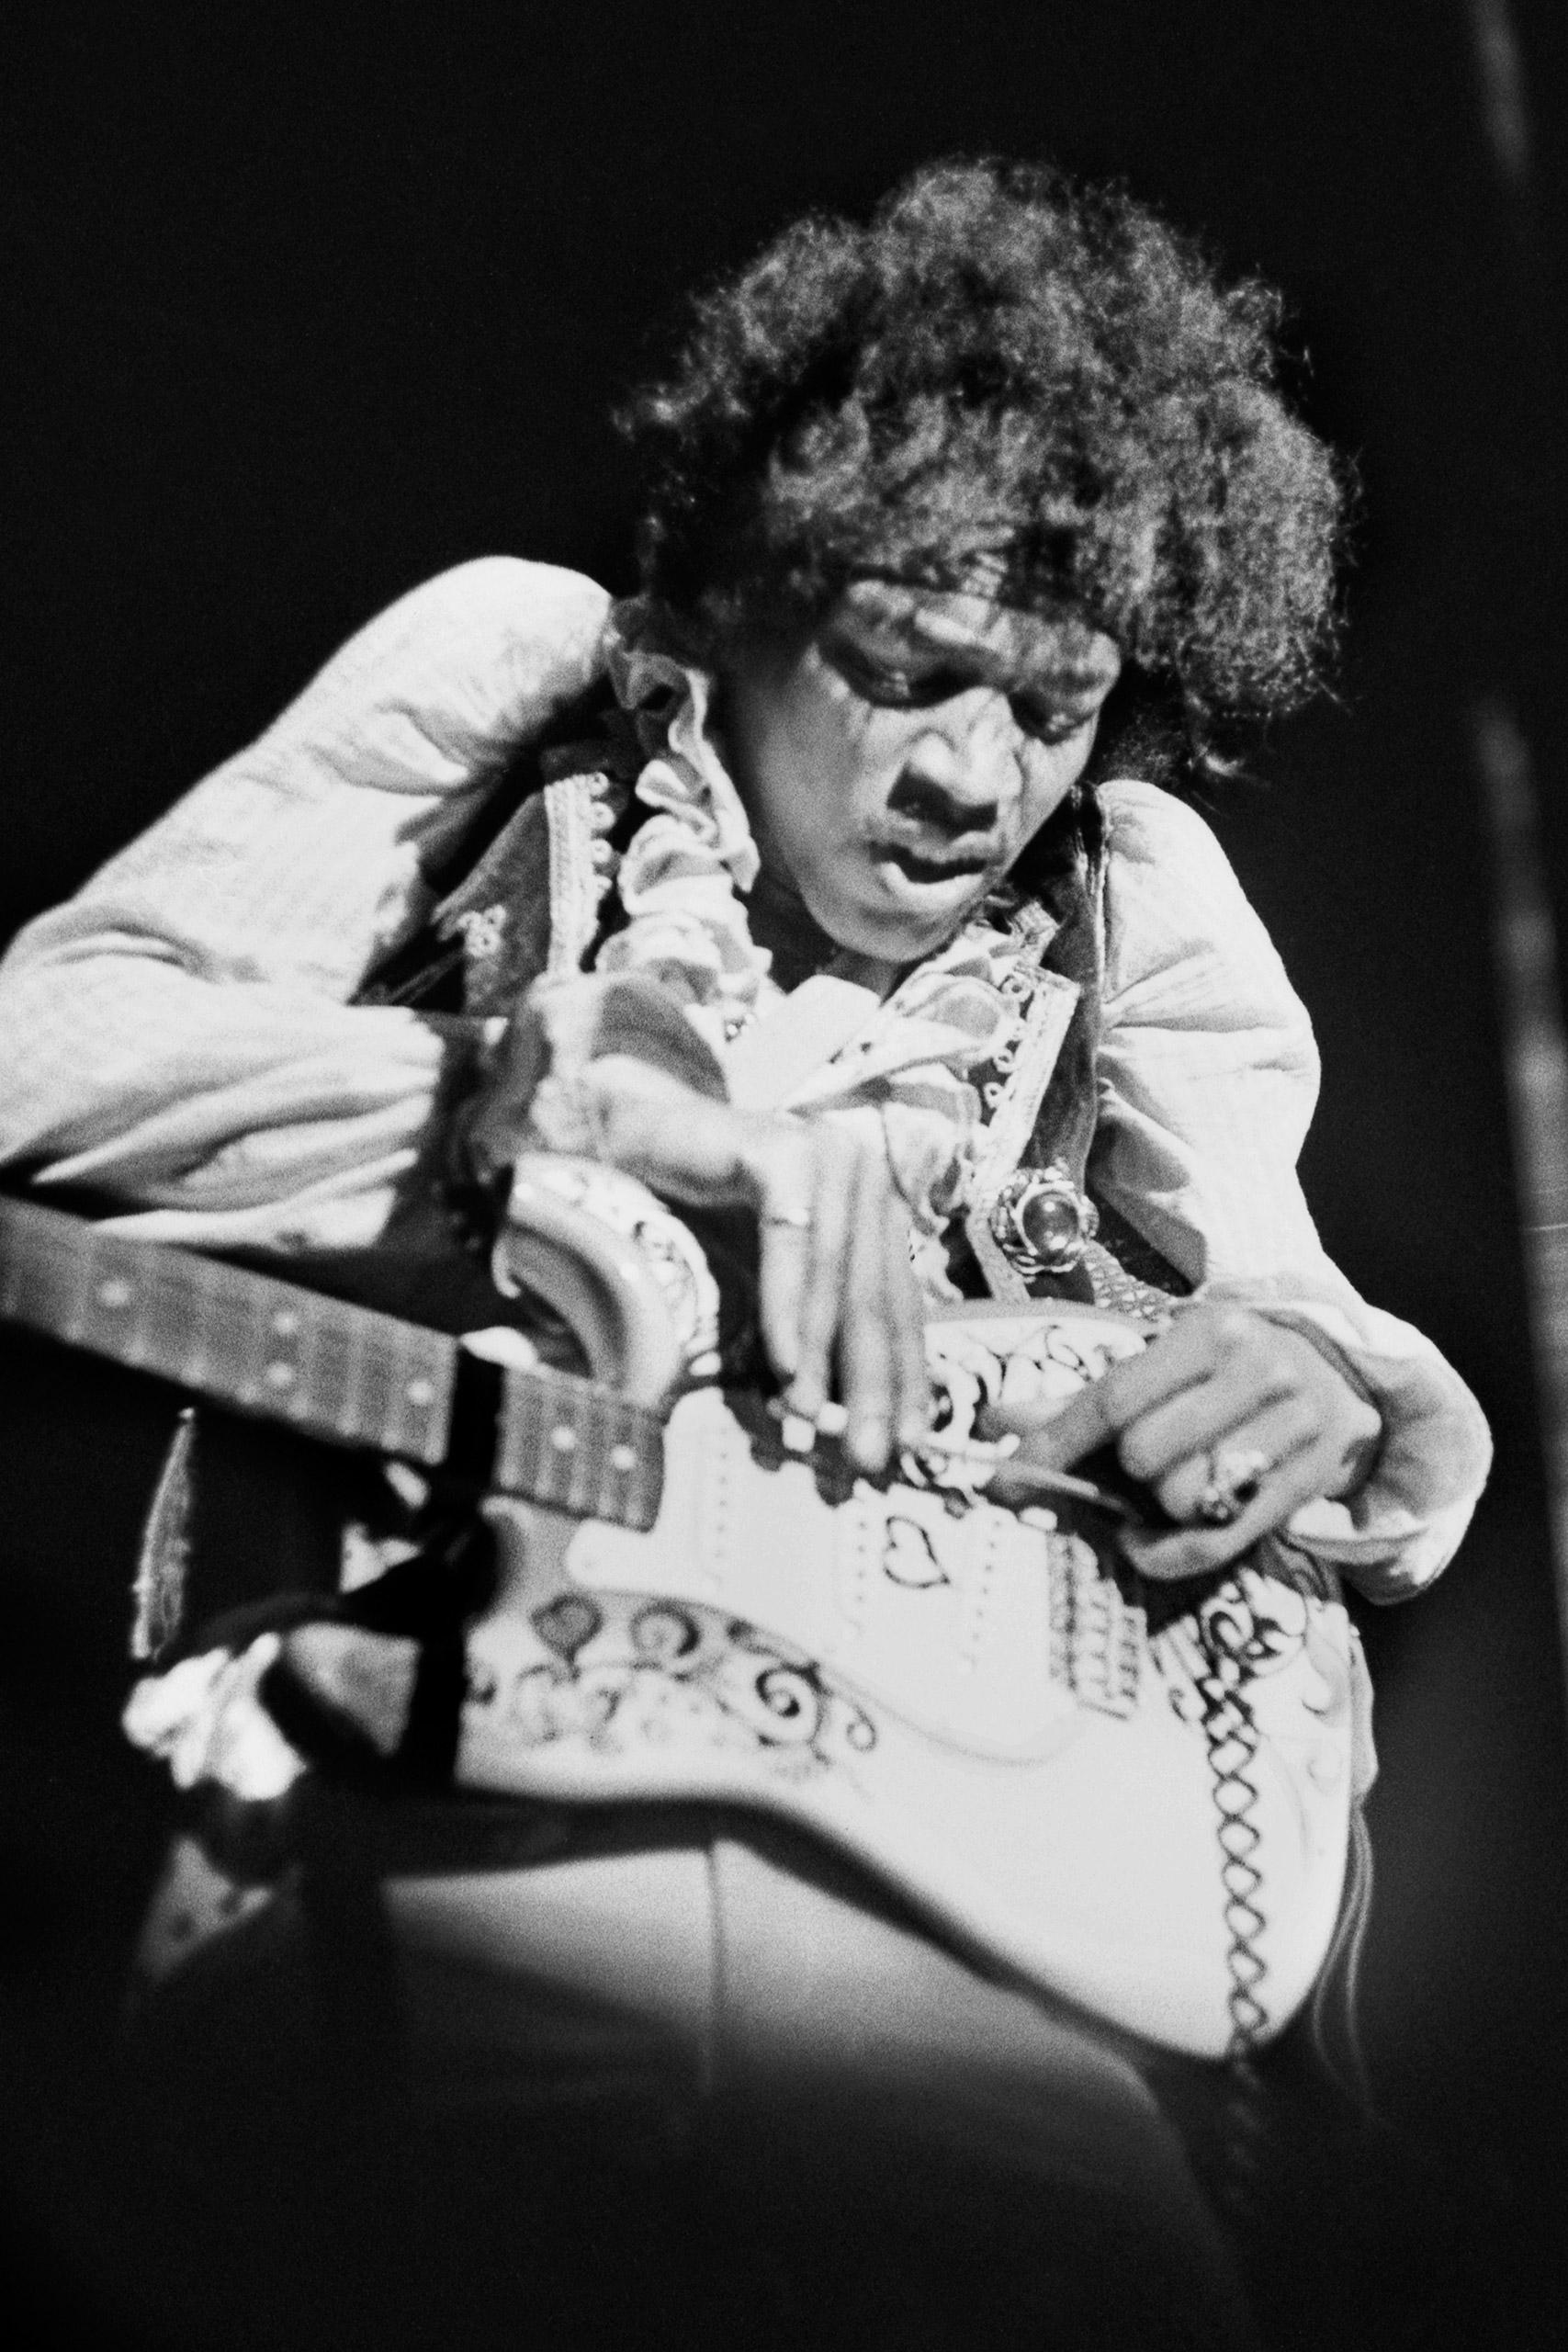 Jimi Hendrix on stage at the Monterey International Pop Music Festival on June 18, 1967.